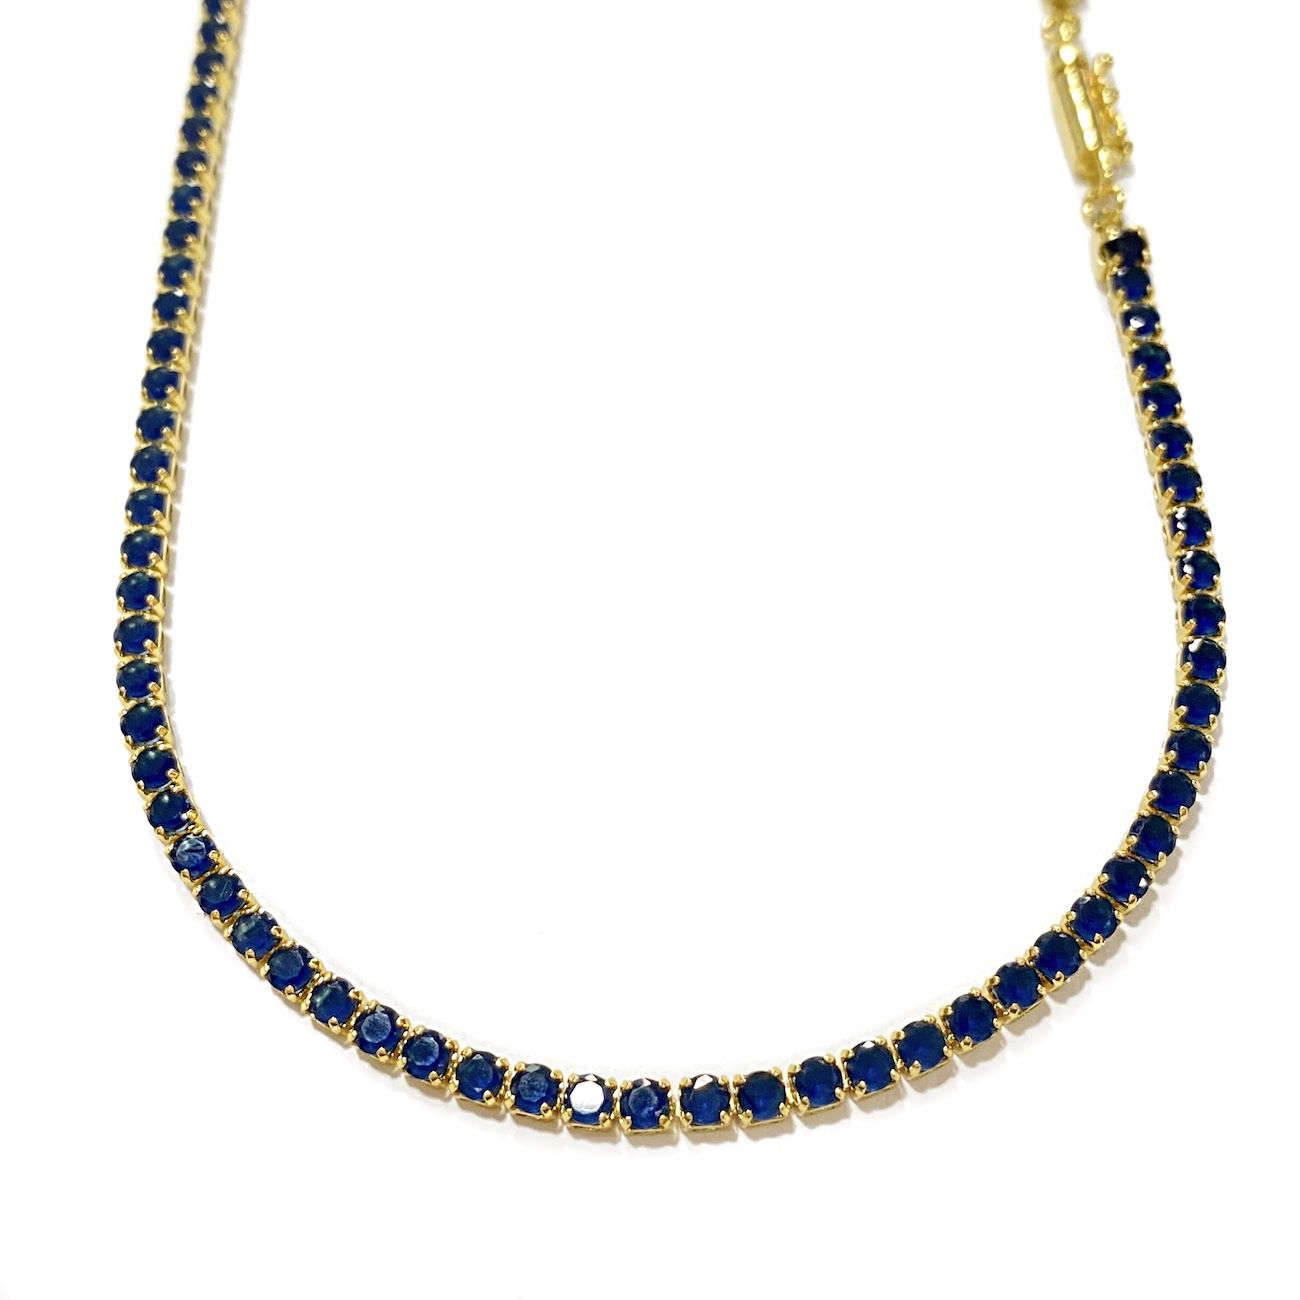 Corrente Riviera Tennis Chain 3mm 60cm 14g (Pedra Zircônia Azul) (Banho Ouro 24k)